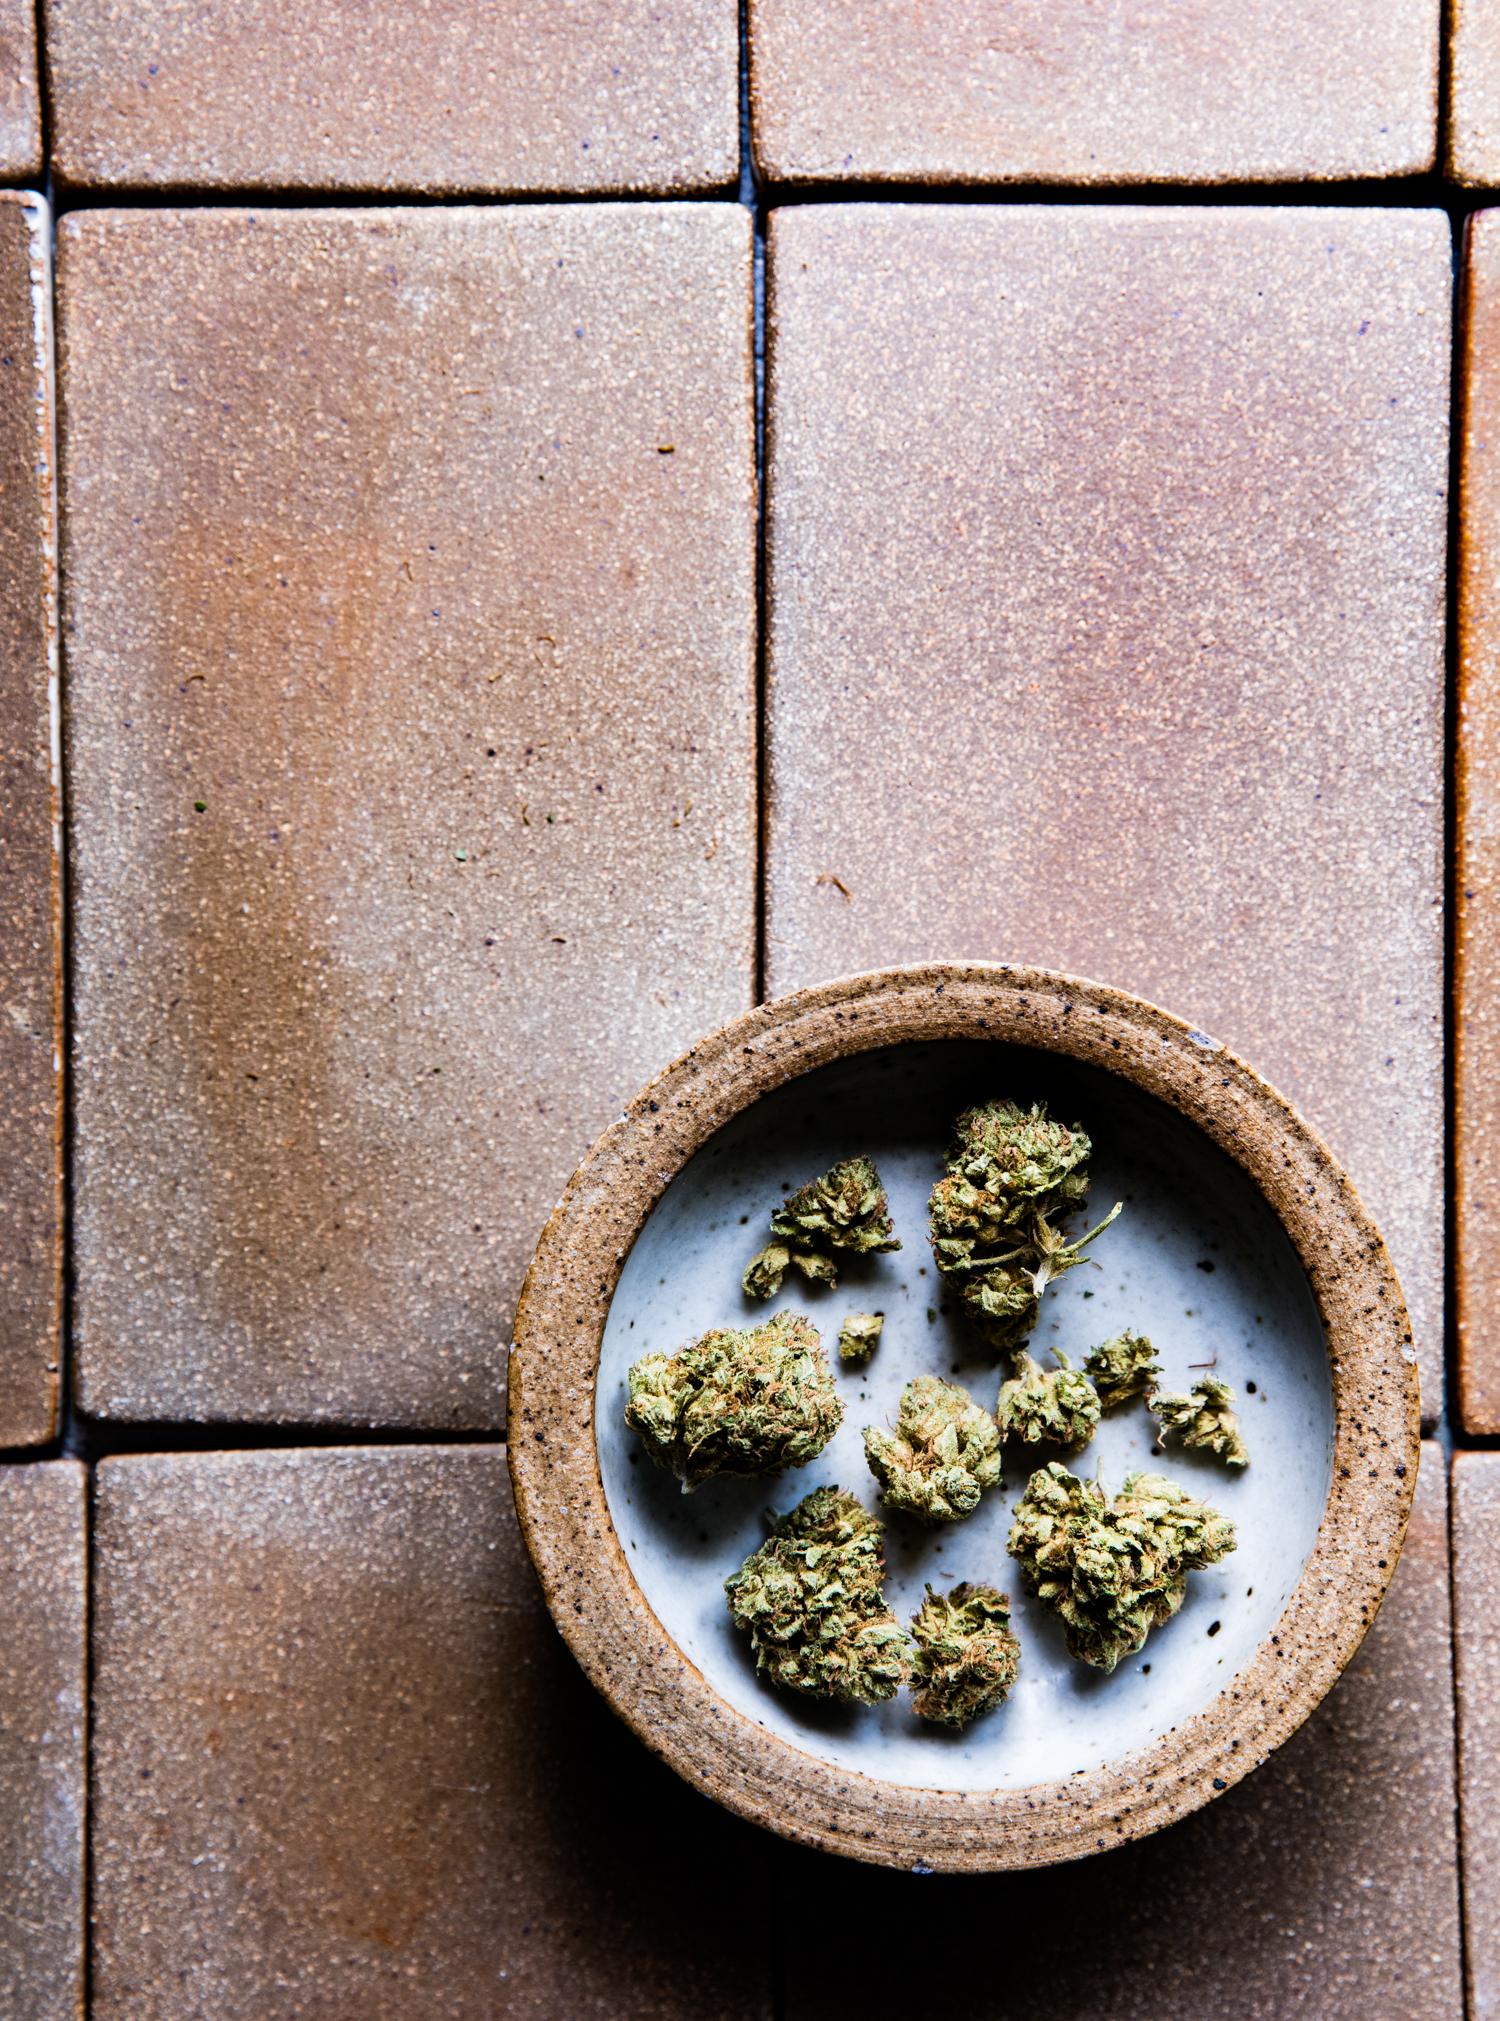 Erinscott_122west_cannabis_-6061.jpg